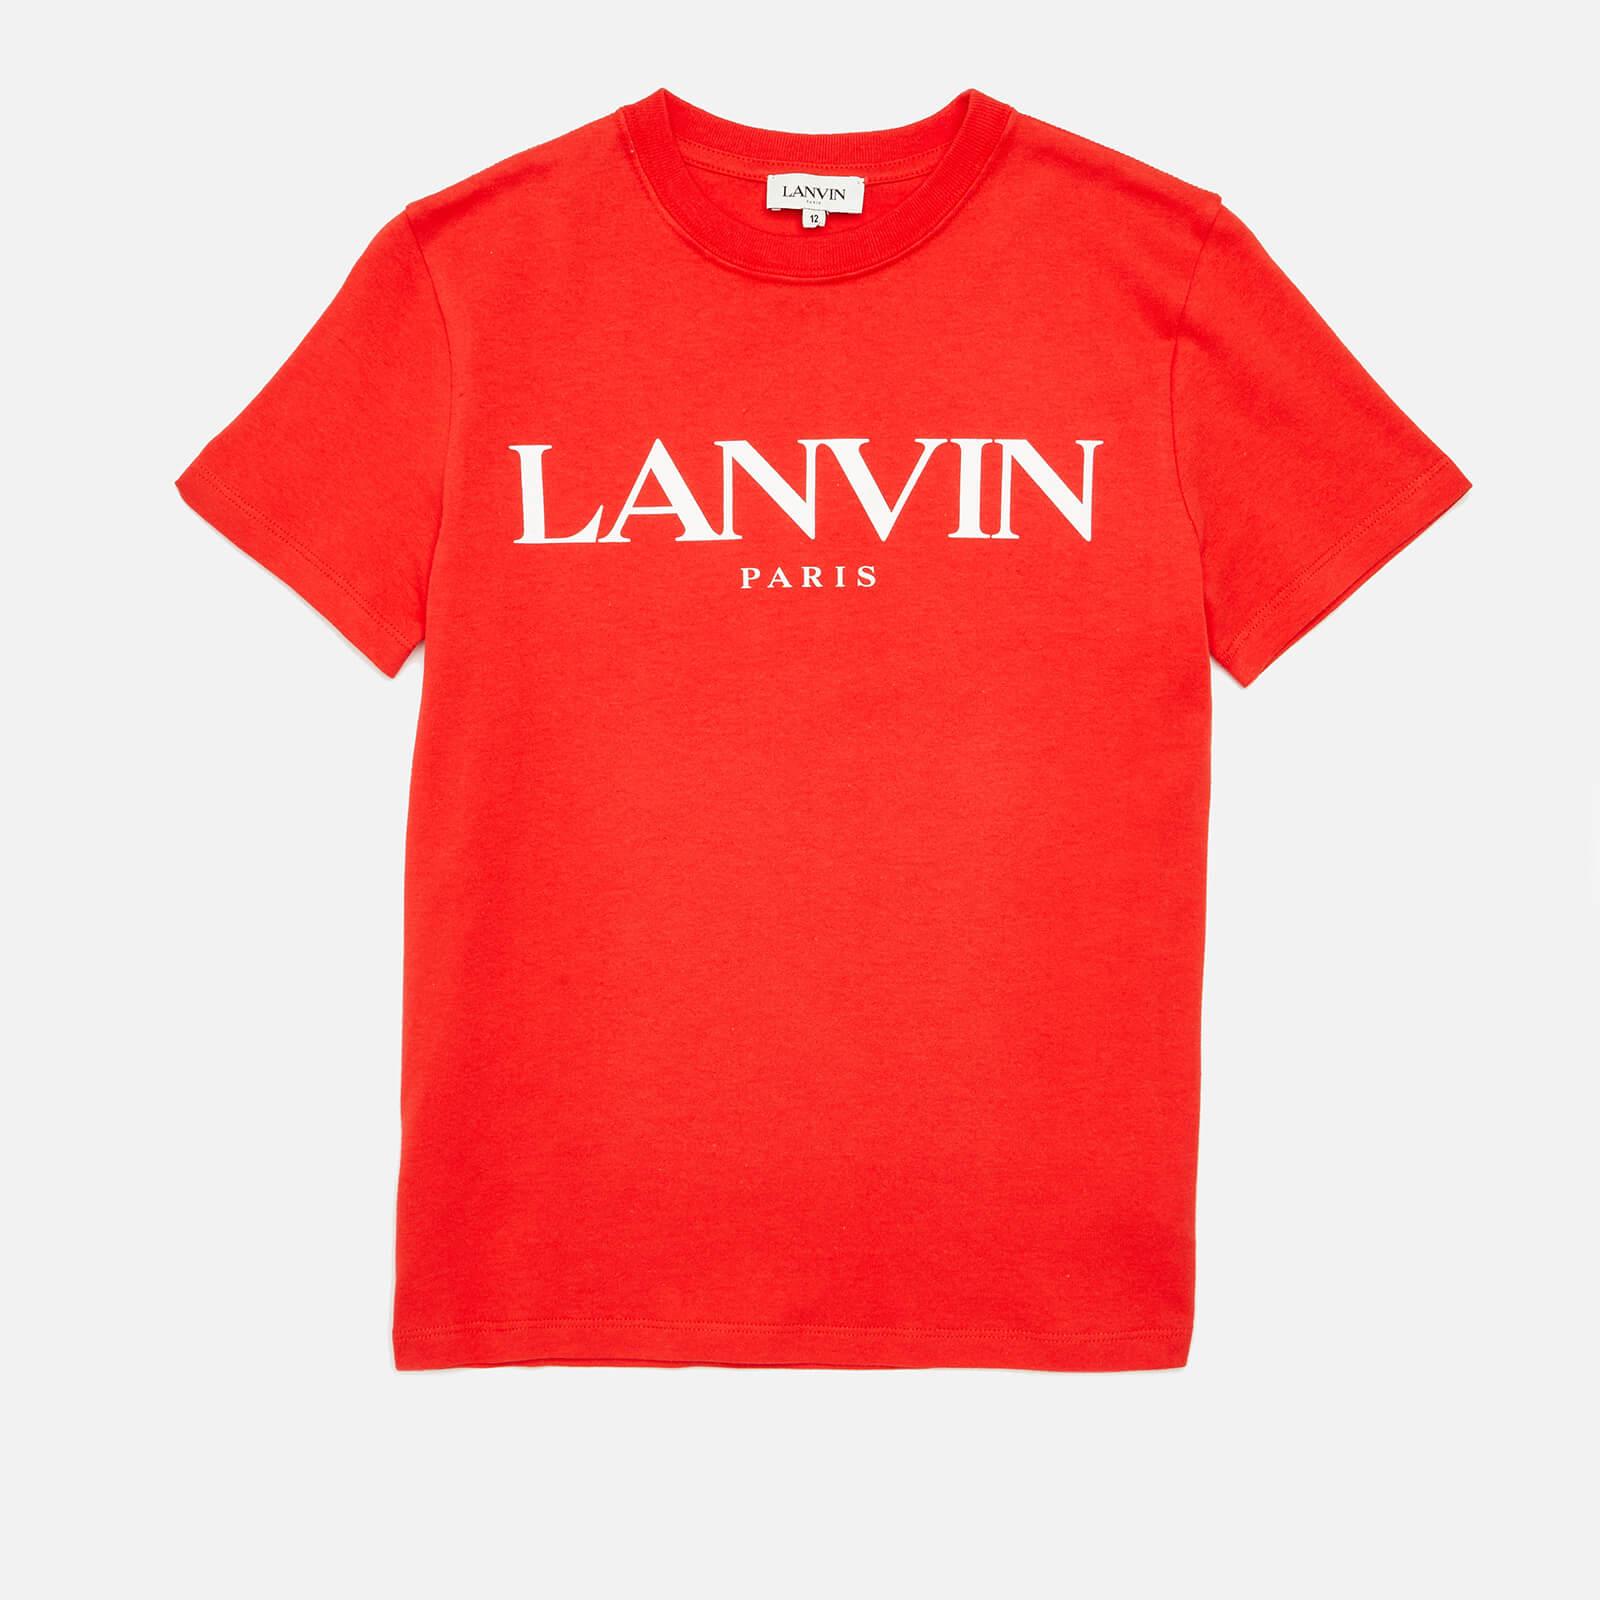 Lanvin Boys' Logo T-Shirt - Bright Red - 8 Years